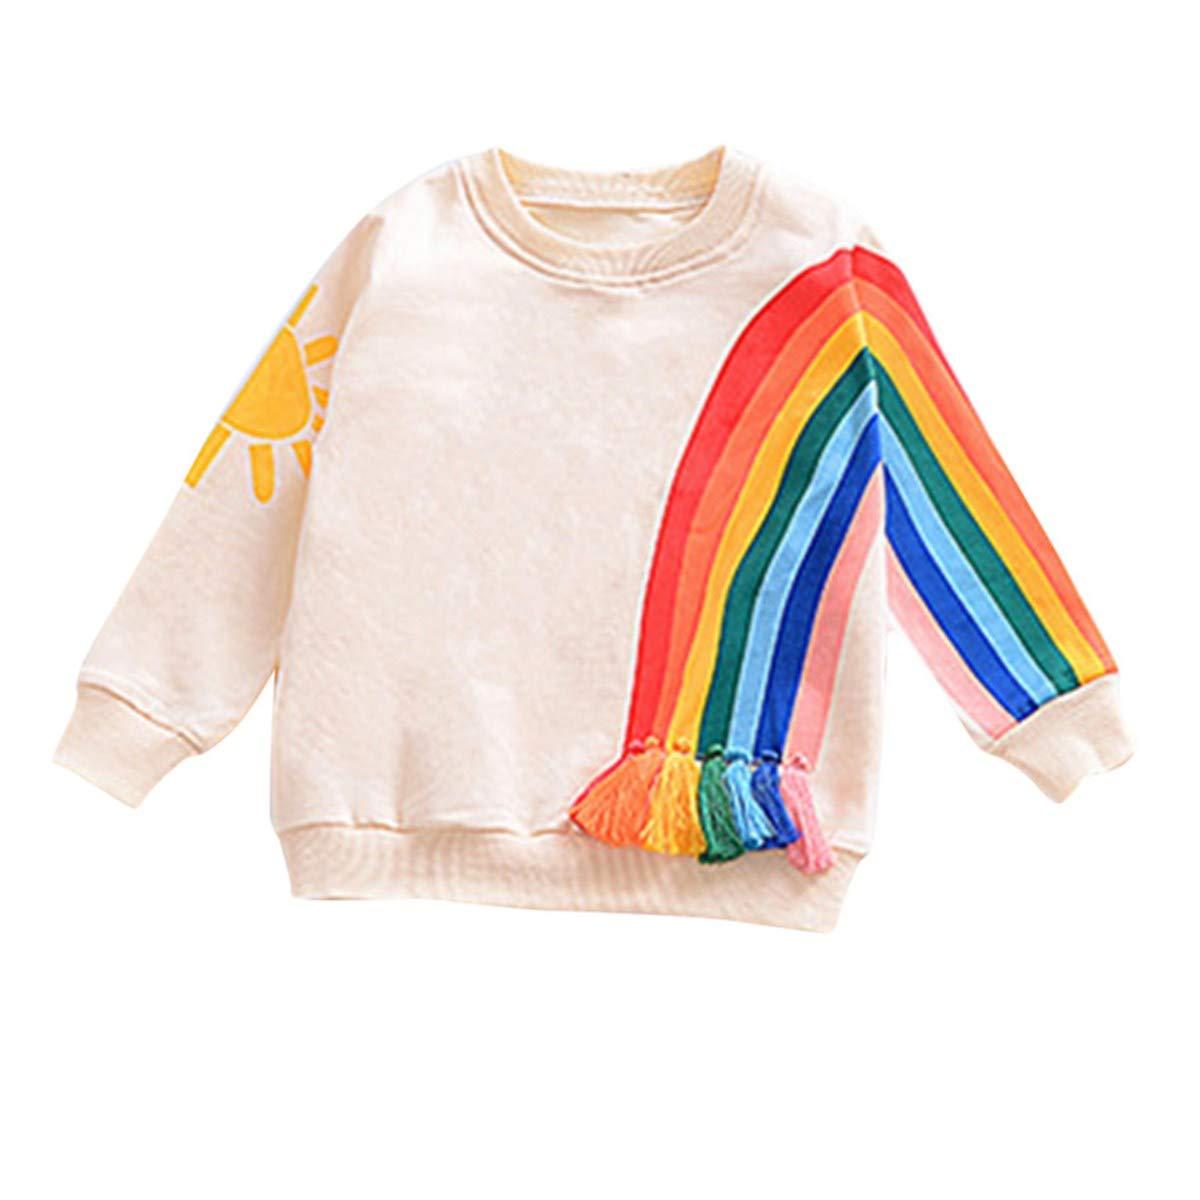 871bc42b4de KONFA Toddler Newborn Baby Boys Girls Rainbow Cardigan Sweater ...